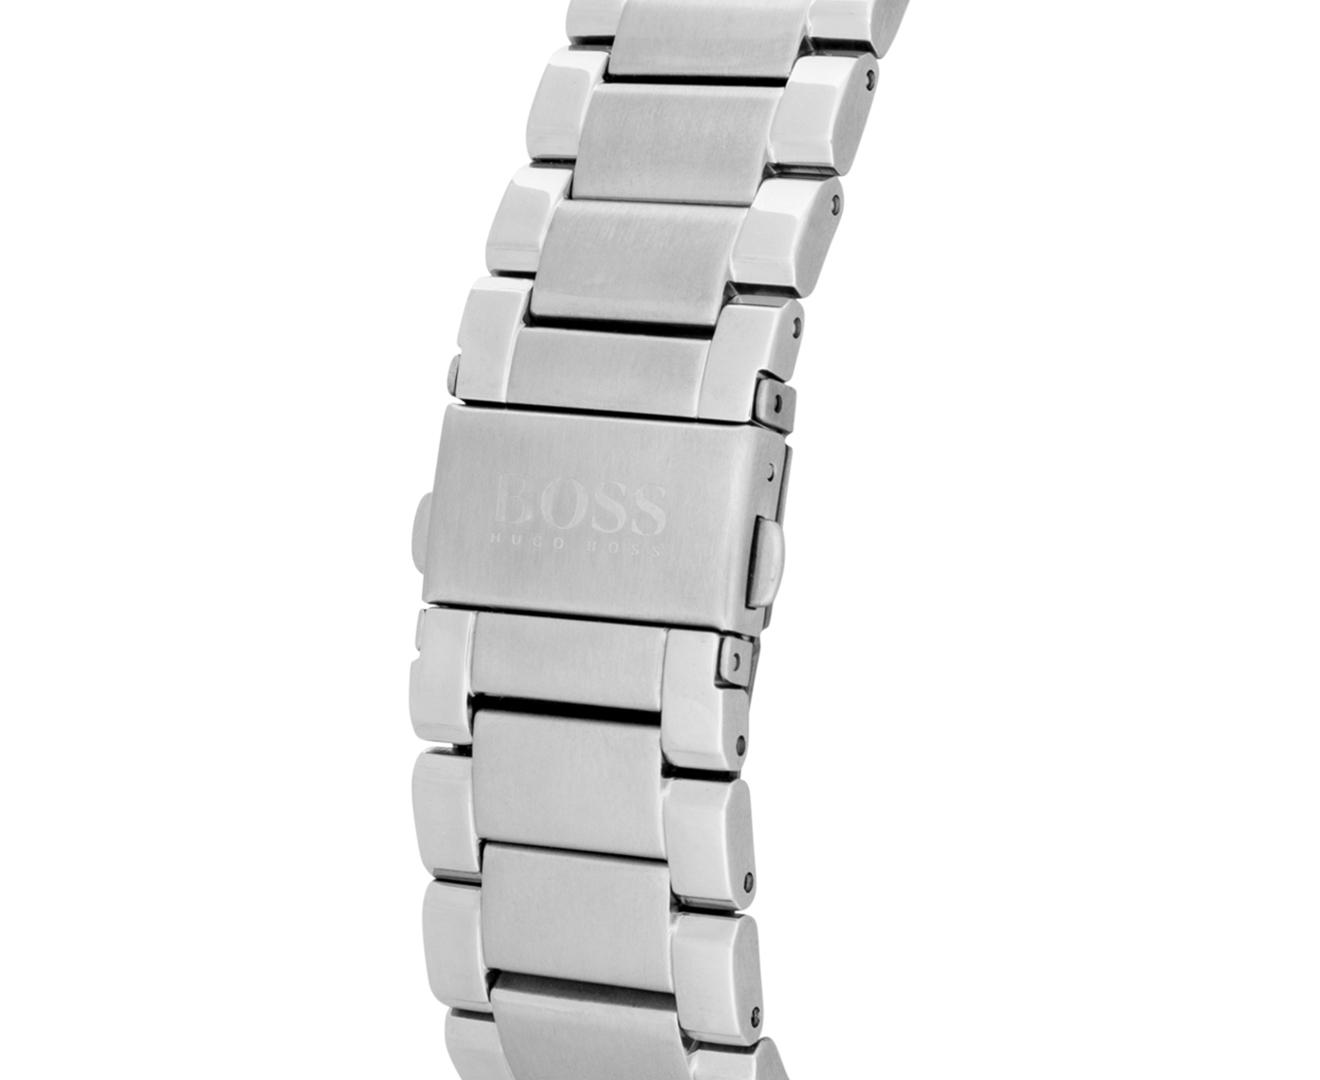 da01bb86b58 Hugo Boss Men s 42mm Essence Stainless Steel Watch - White Silver ...